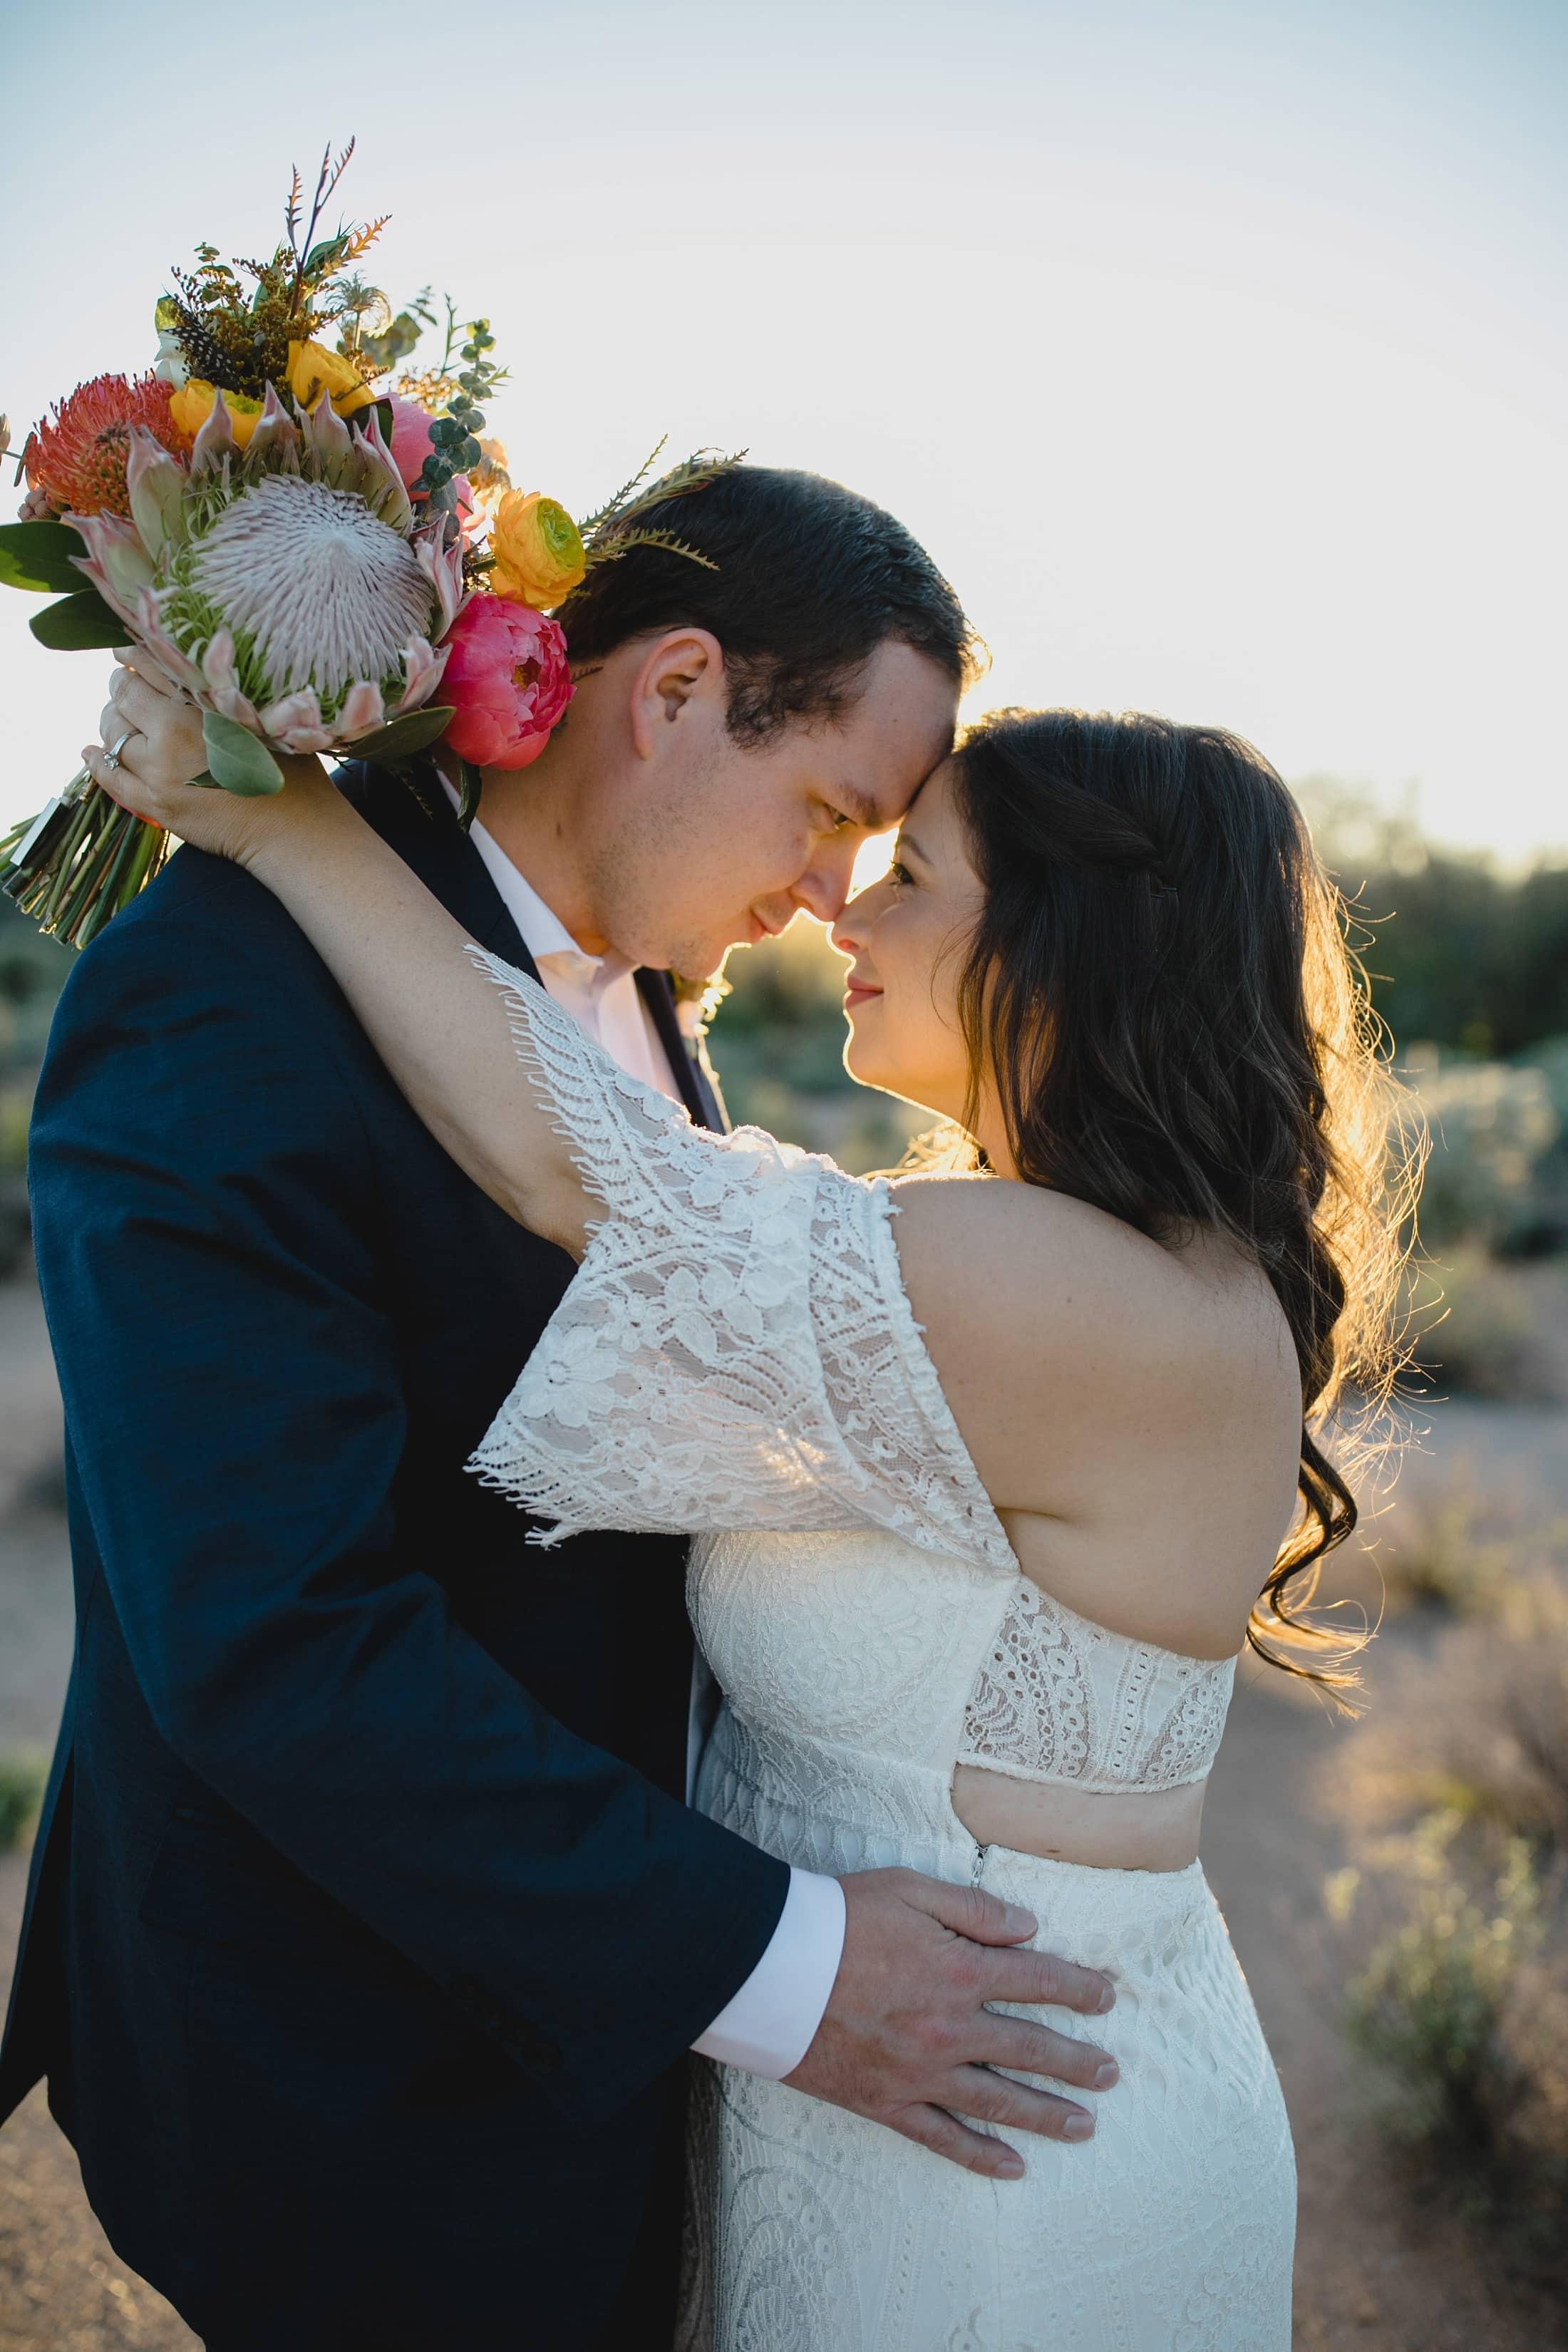 Arizona boho small wedding in desert